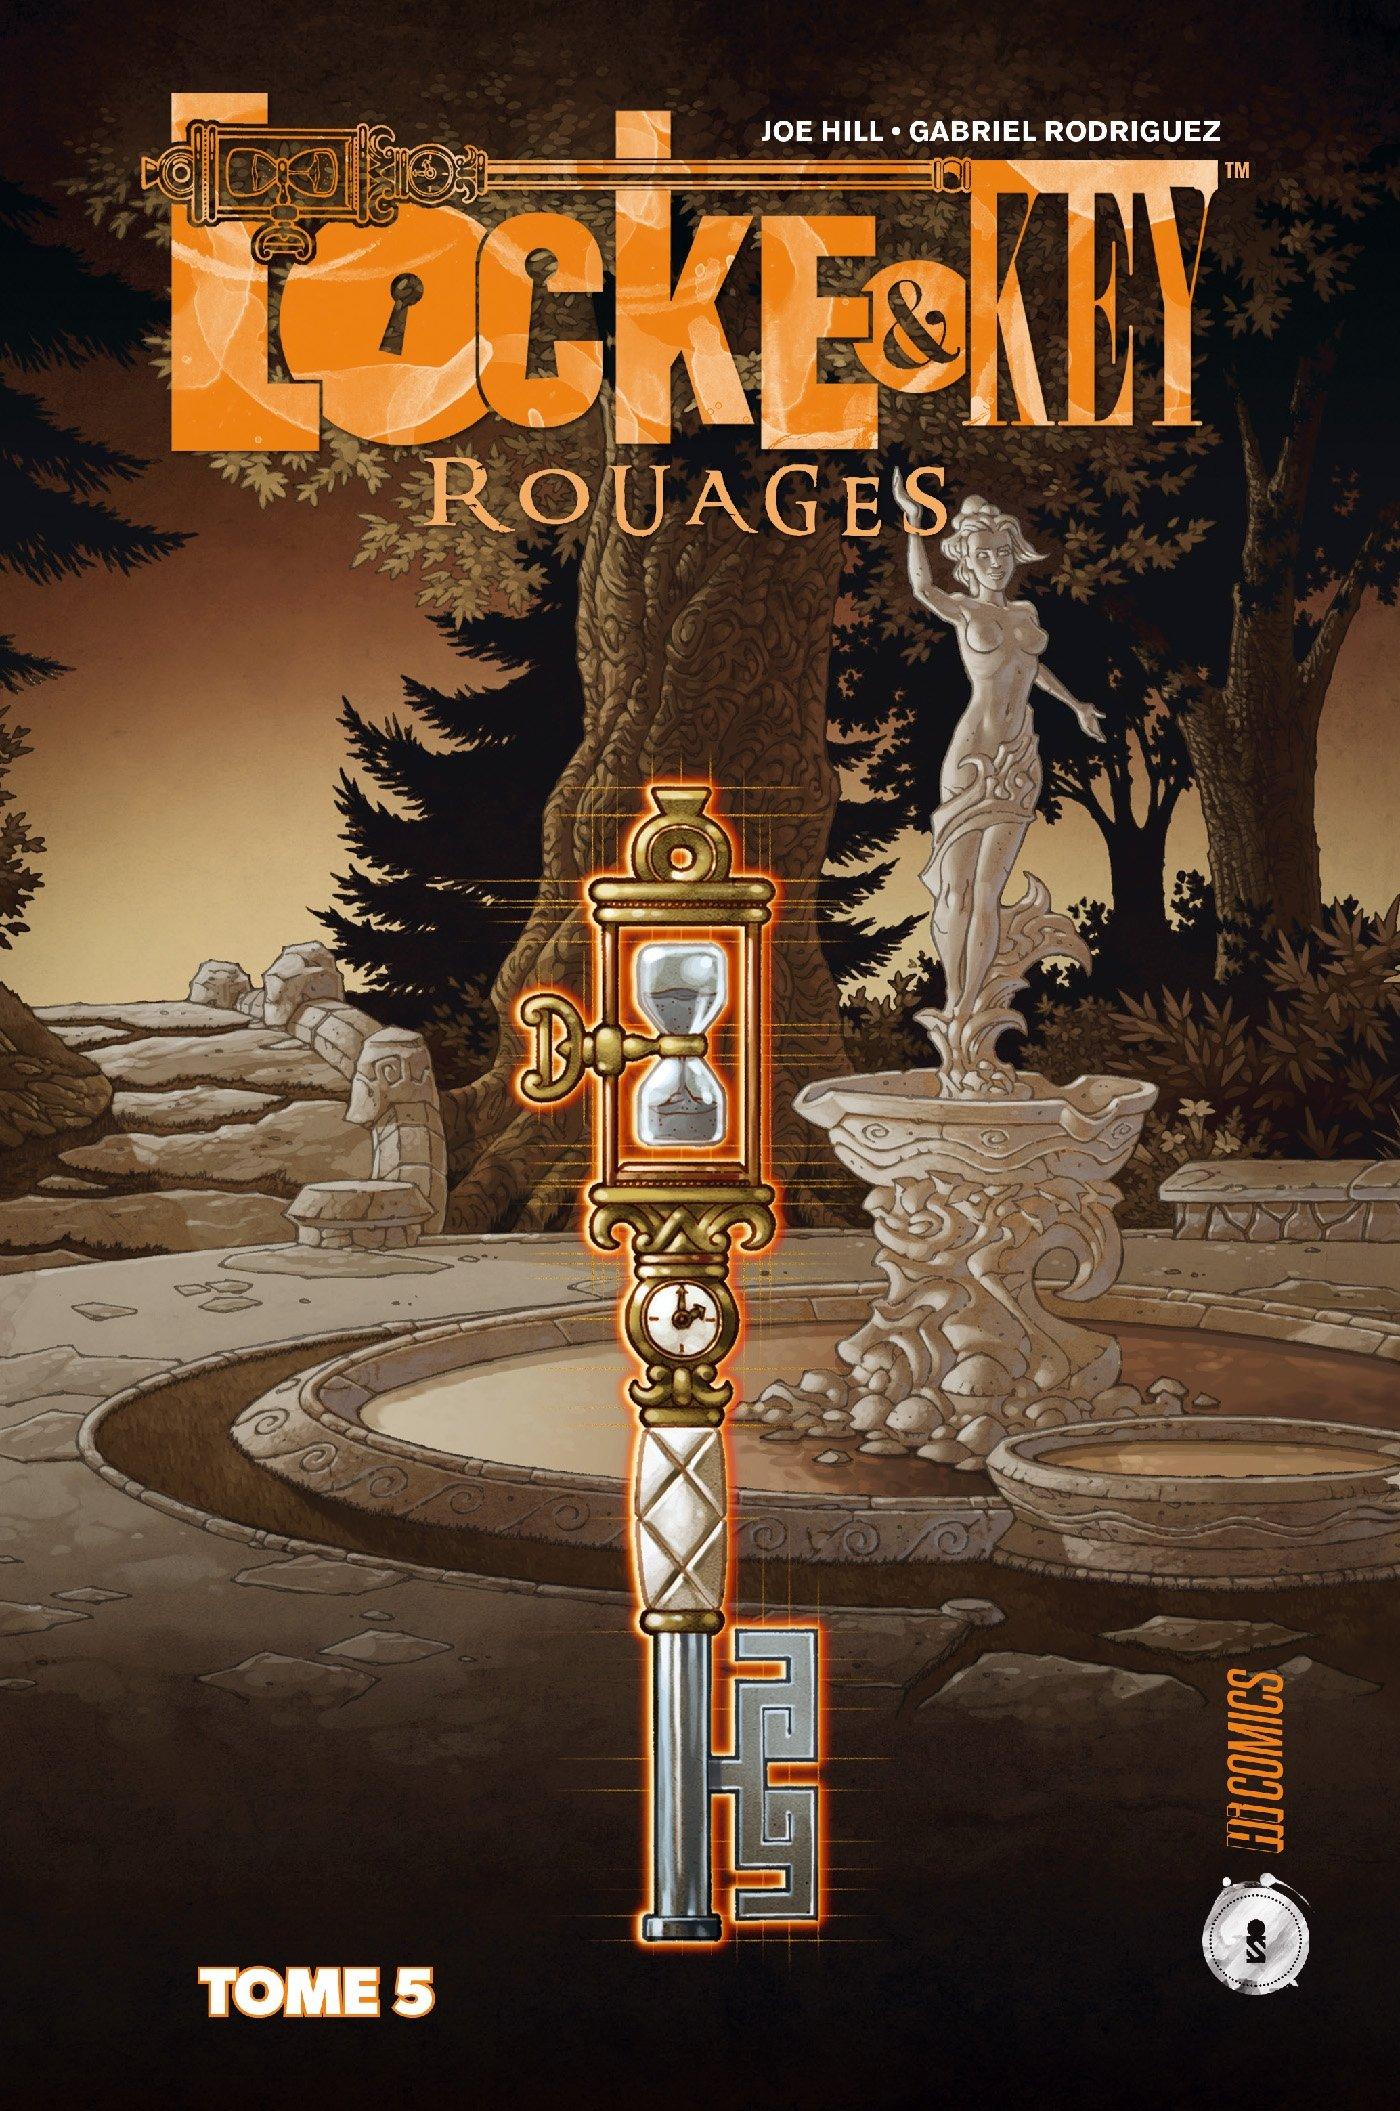 Locke & Key Tome 5 : Rouages (NED) (VF)